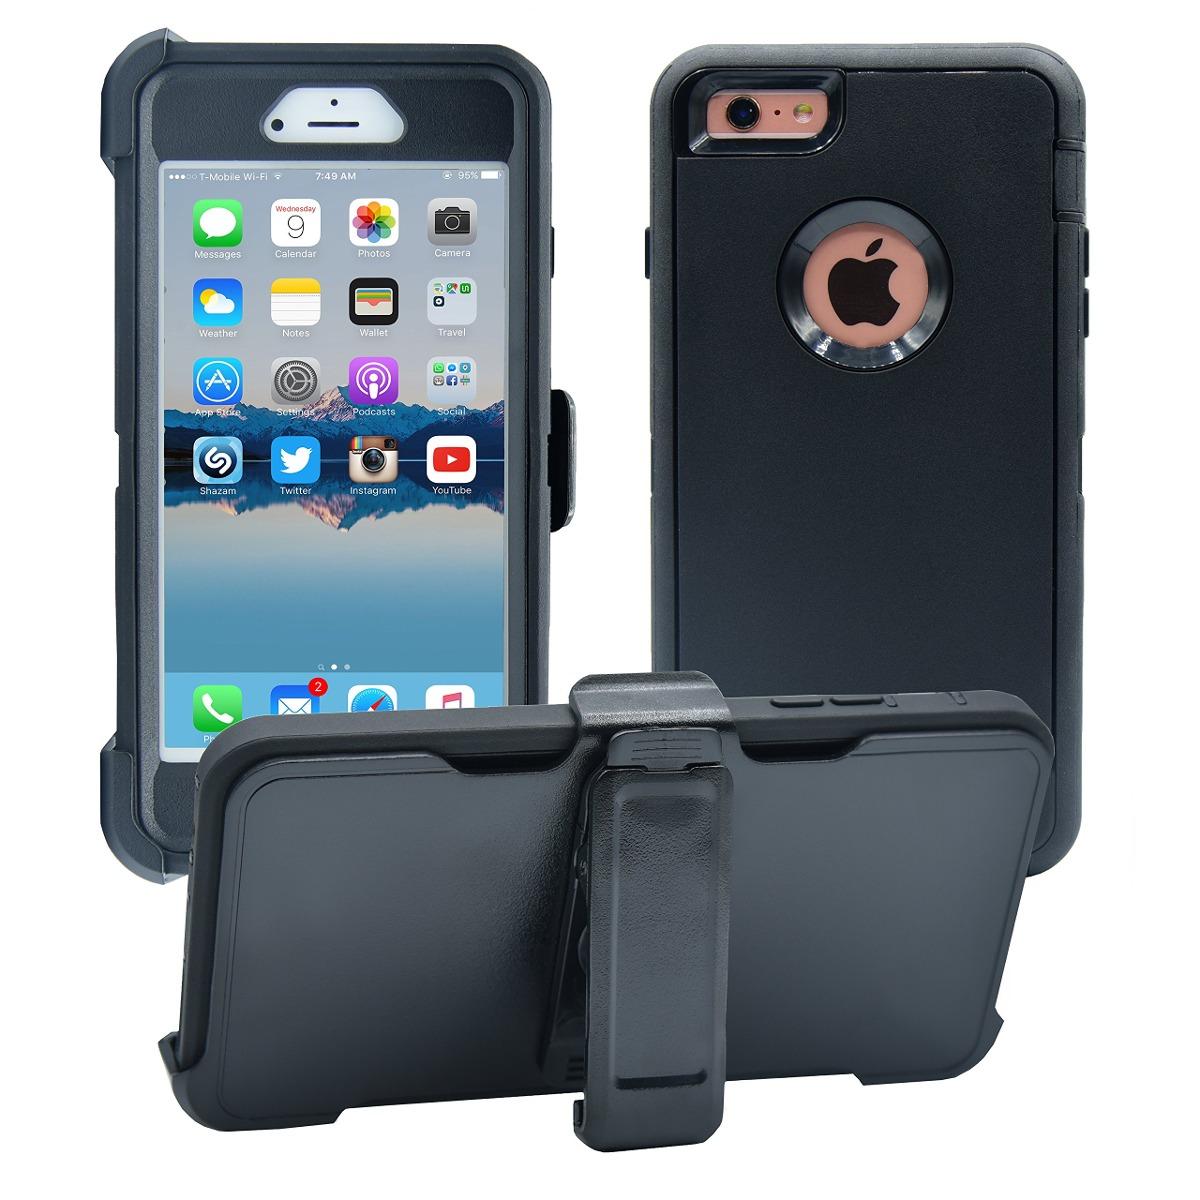 12797676d34 Funda iPhone 6 Plus / 6s Plus | Protector De Pantalla 3 E - S/ 183 ...